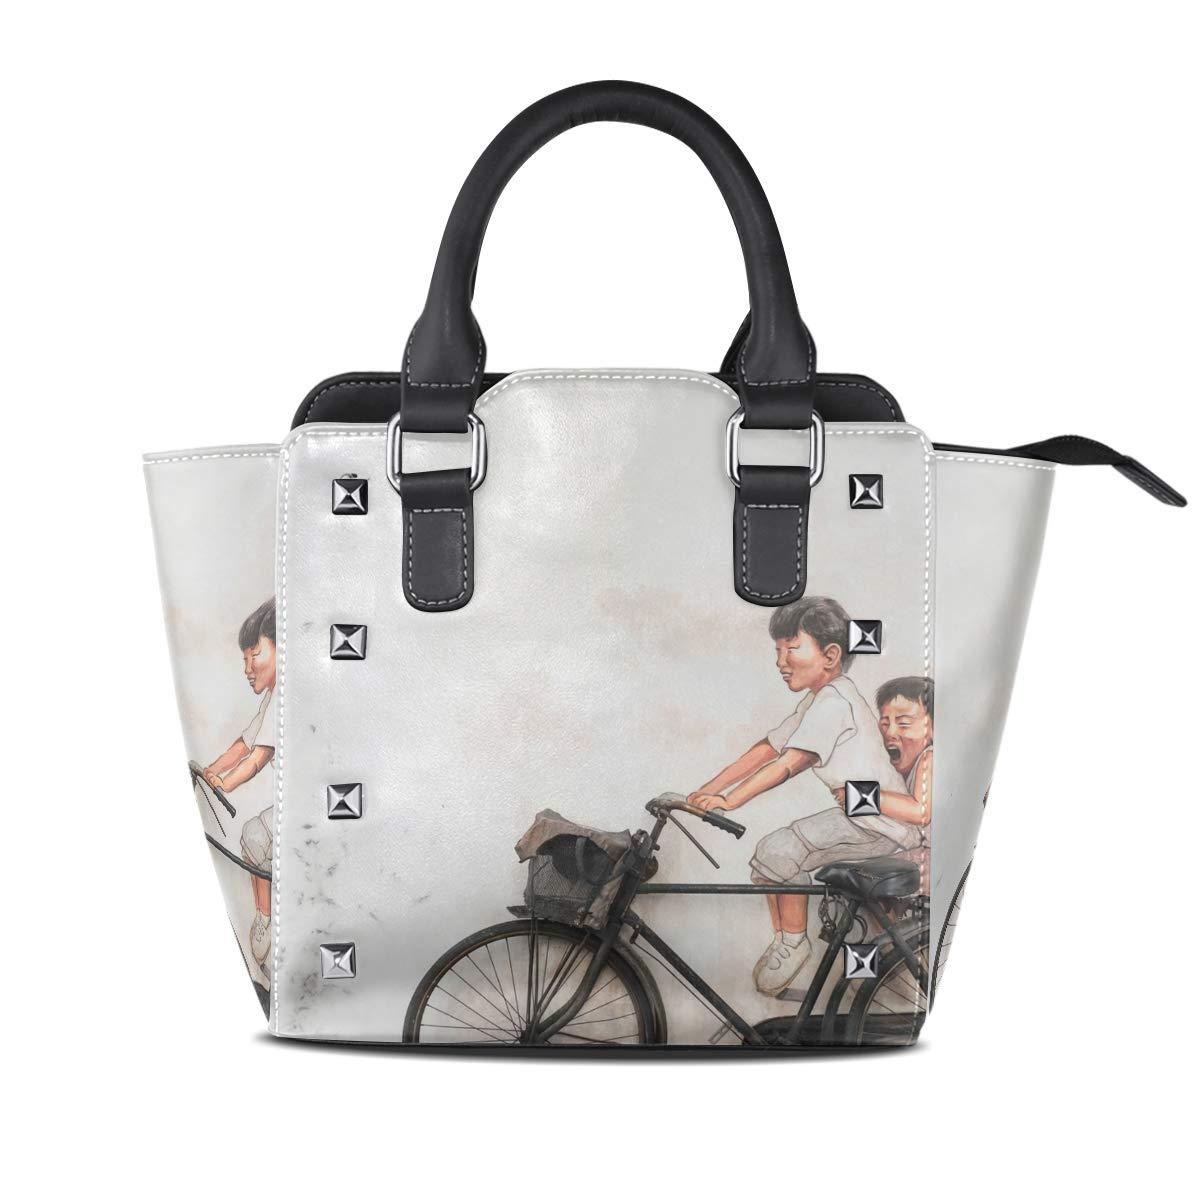 Design 2 Handbag Brown Brick Wall With Woman Painting Genuine Leather Tote Rivet Bag Shoulder Strap Top Handle Women